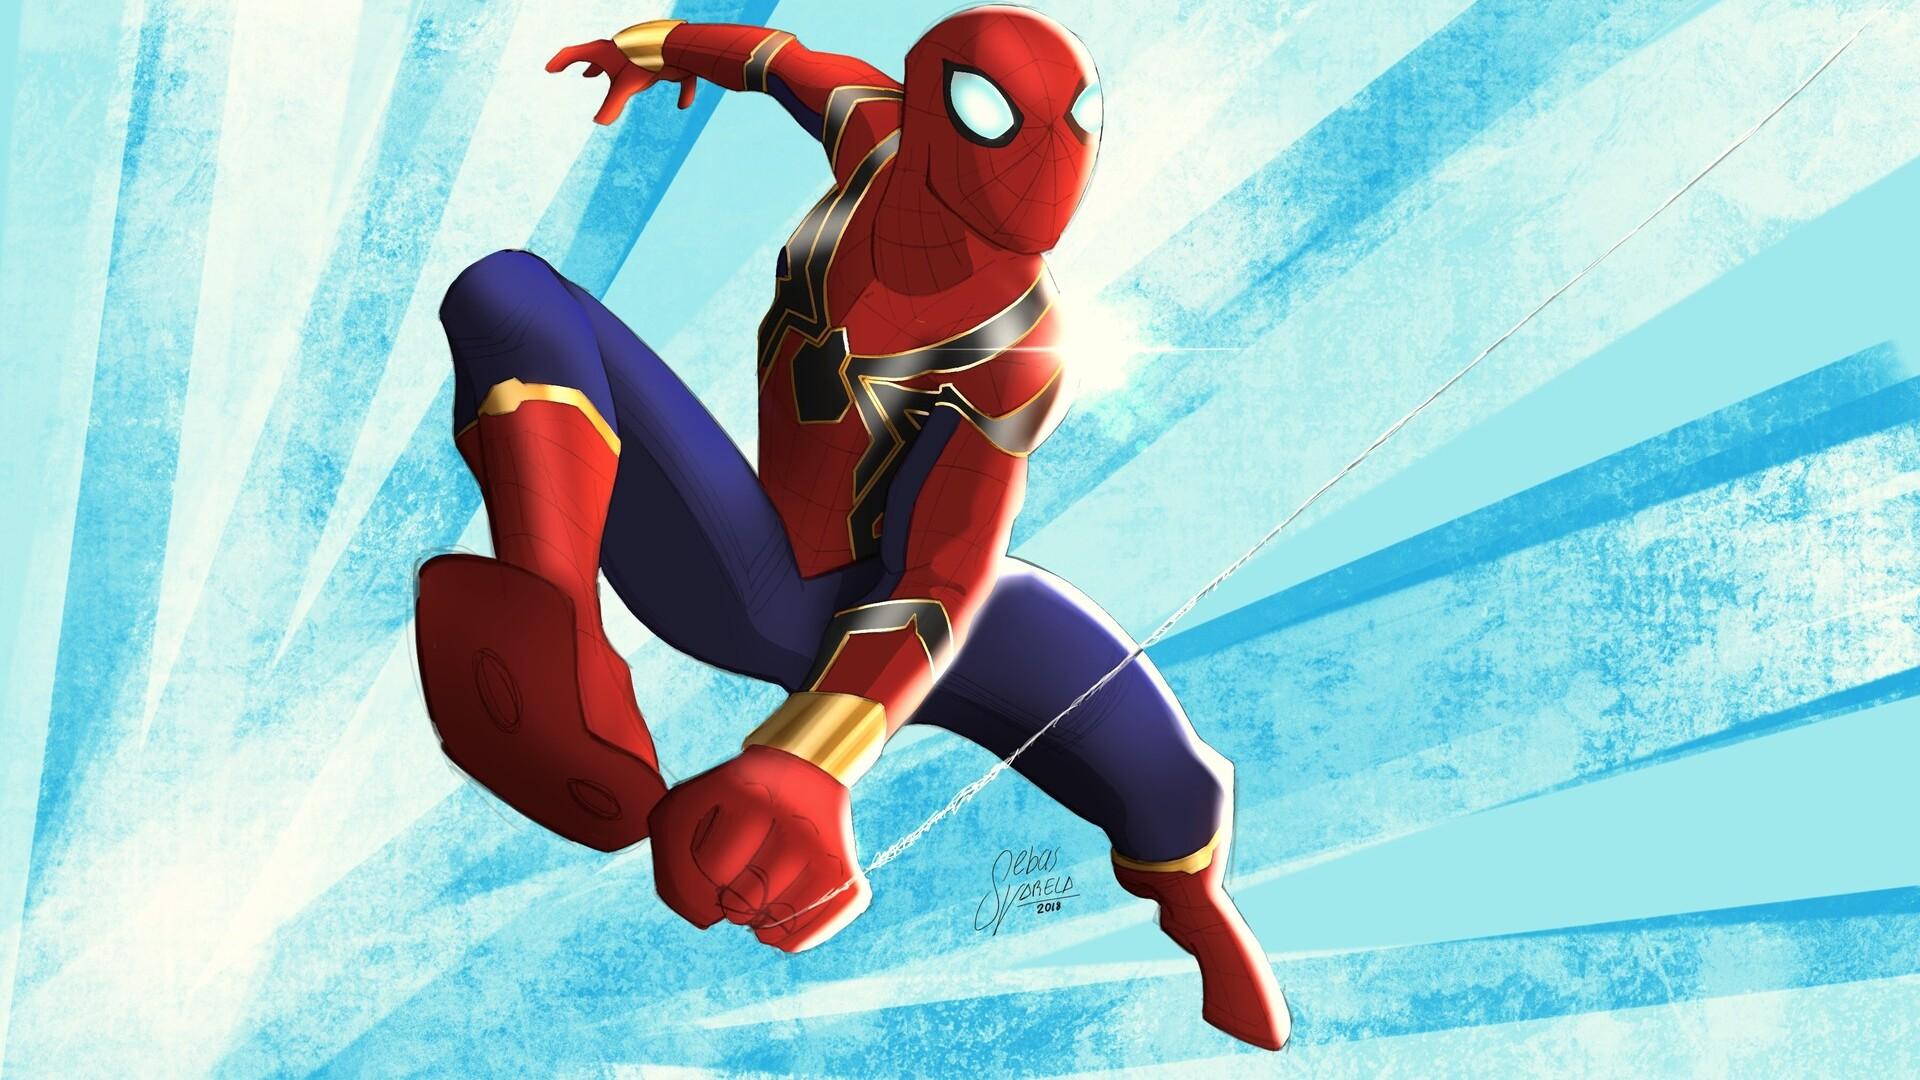 1920x1080 Iron Spiderman Suit Laptop Full Hd 1080p Hd 4k